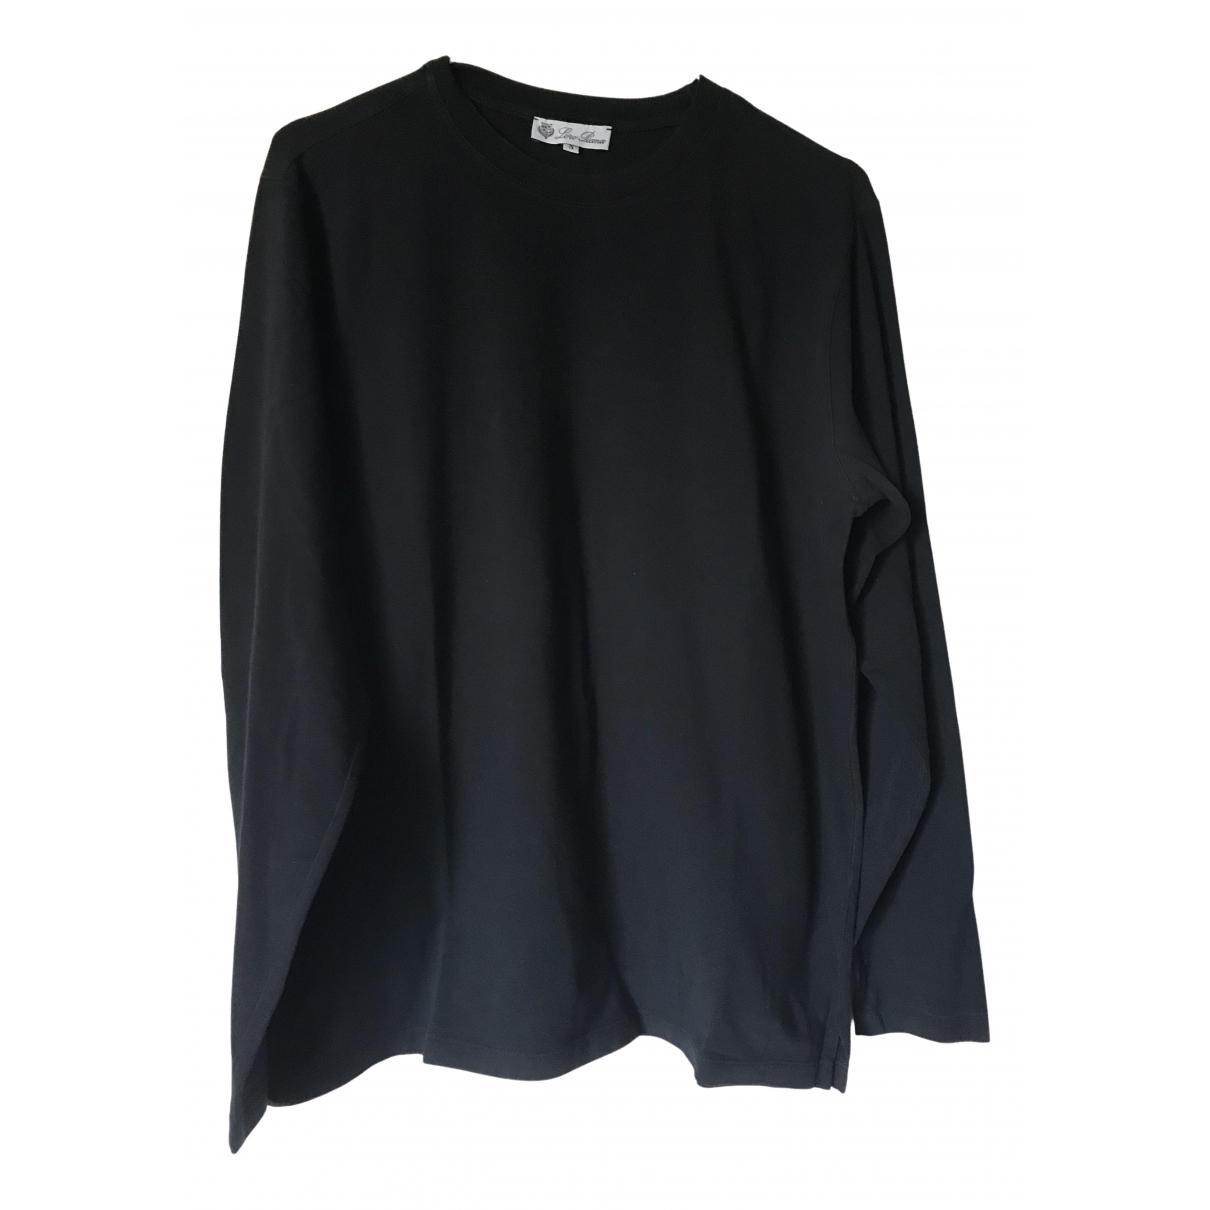 Loro Piana N Black Cotton Knitwear & Sweatshirts for Men S International